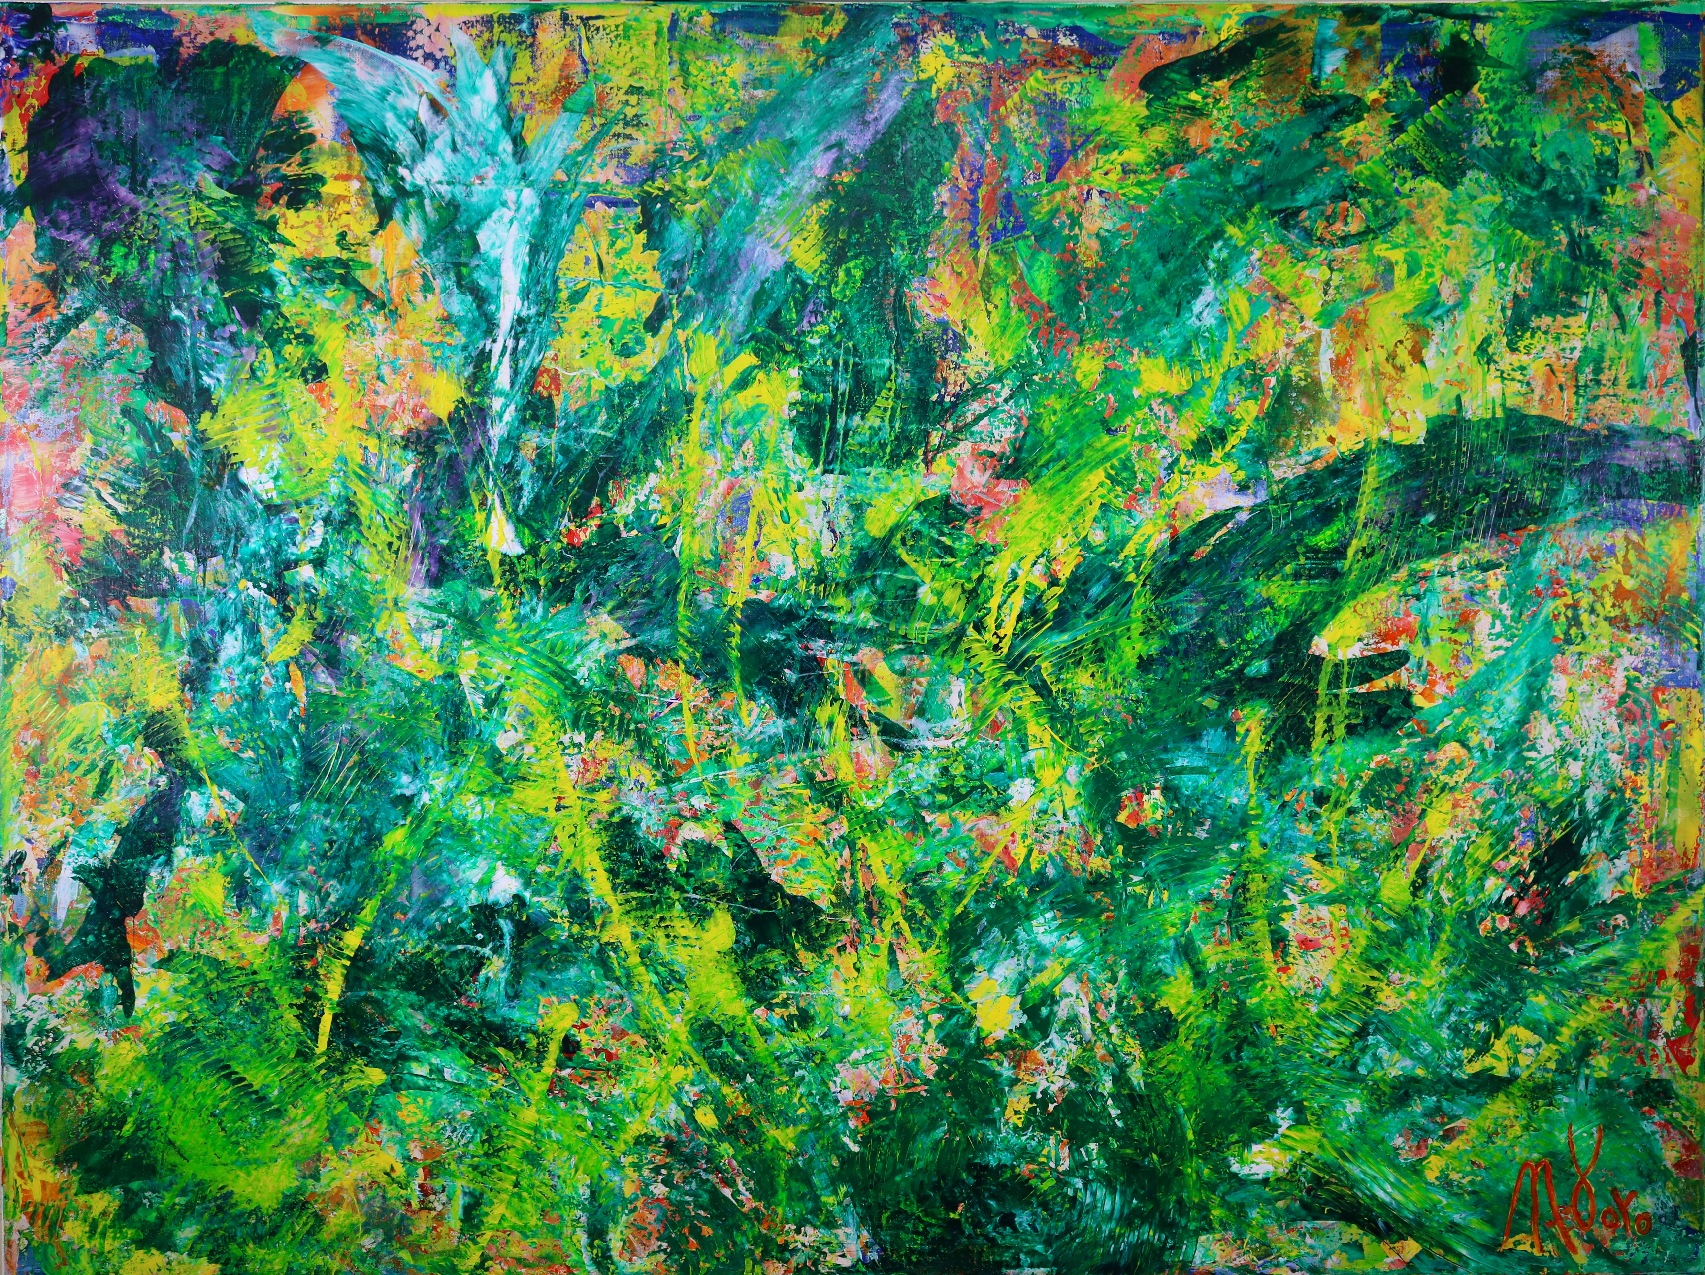 In The Wilderness - Childhood Dreams by Nestor Toro